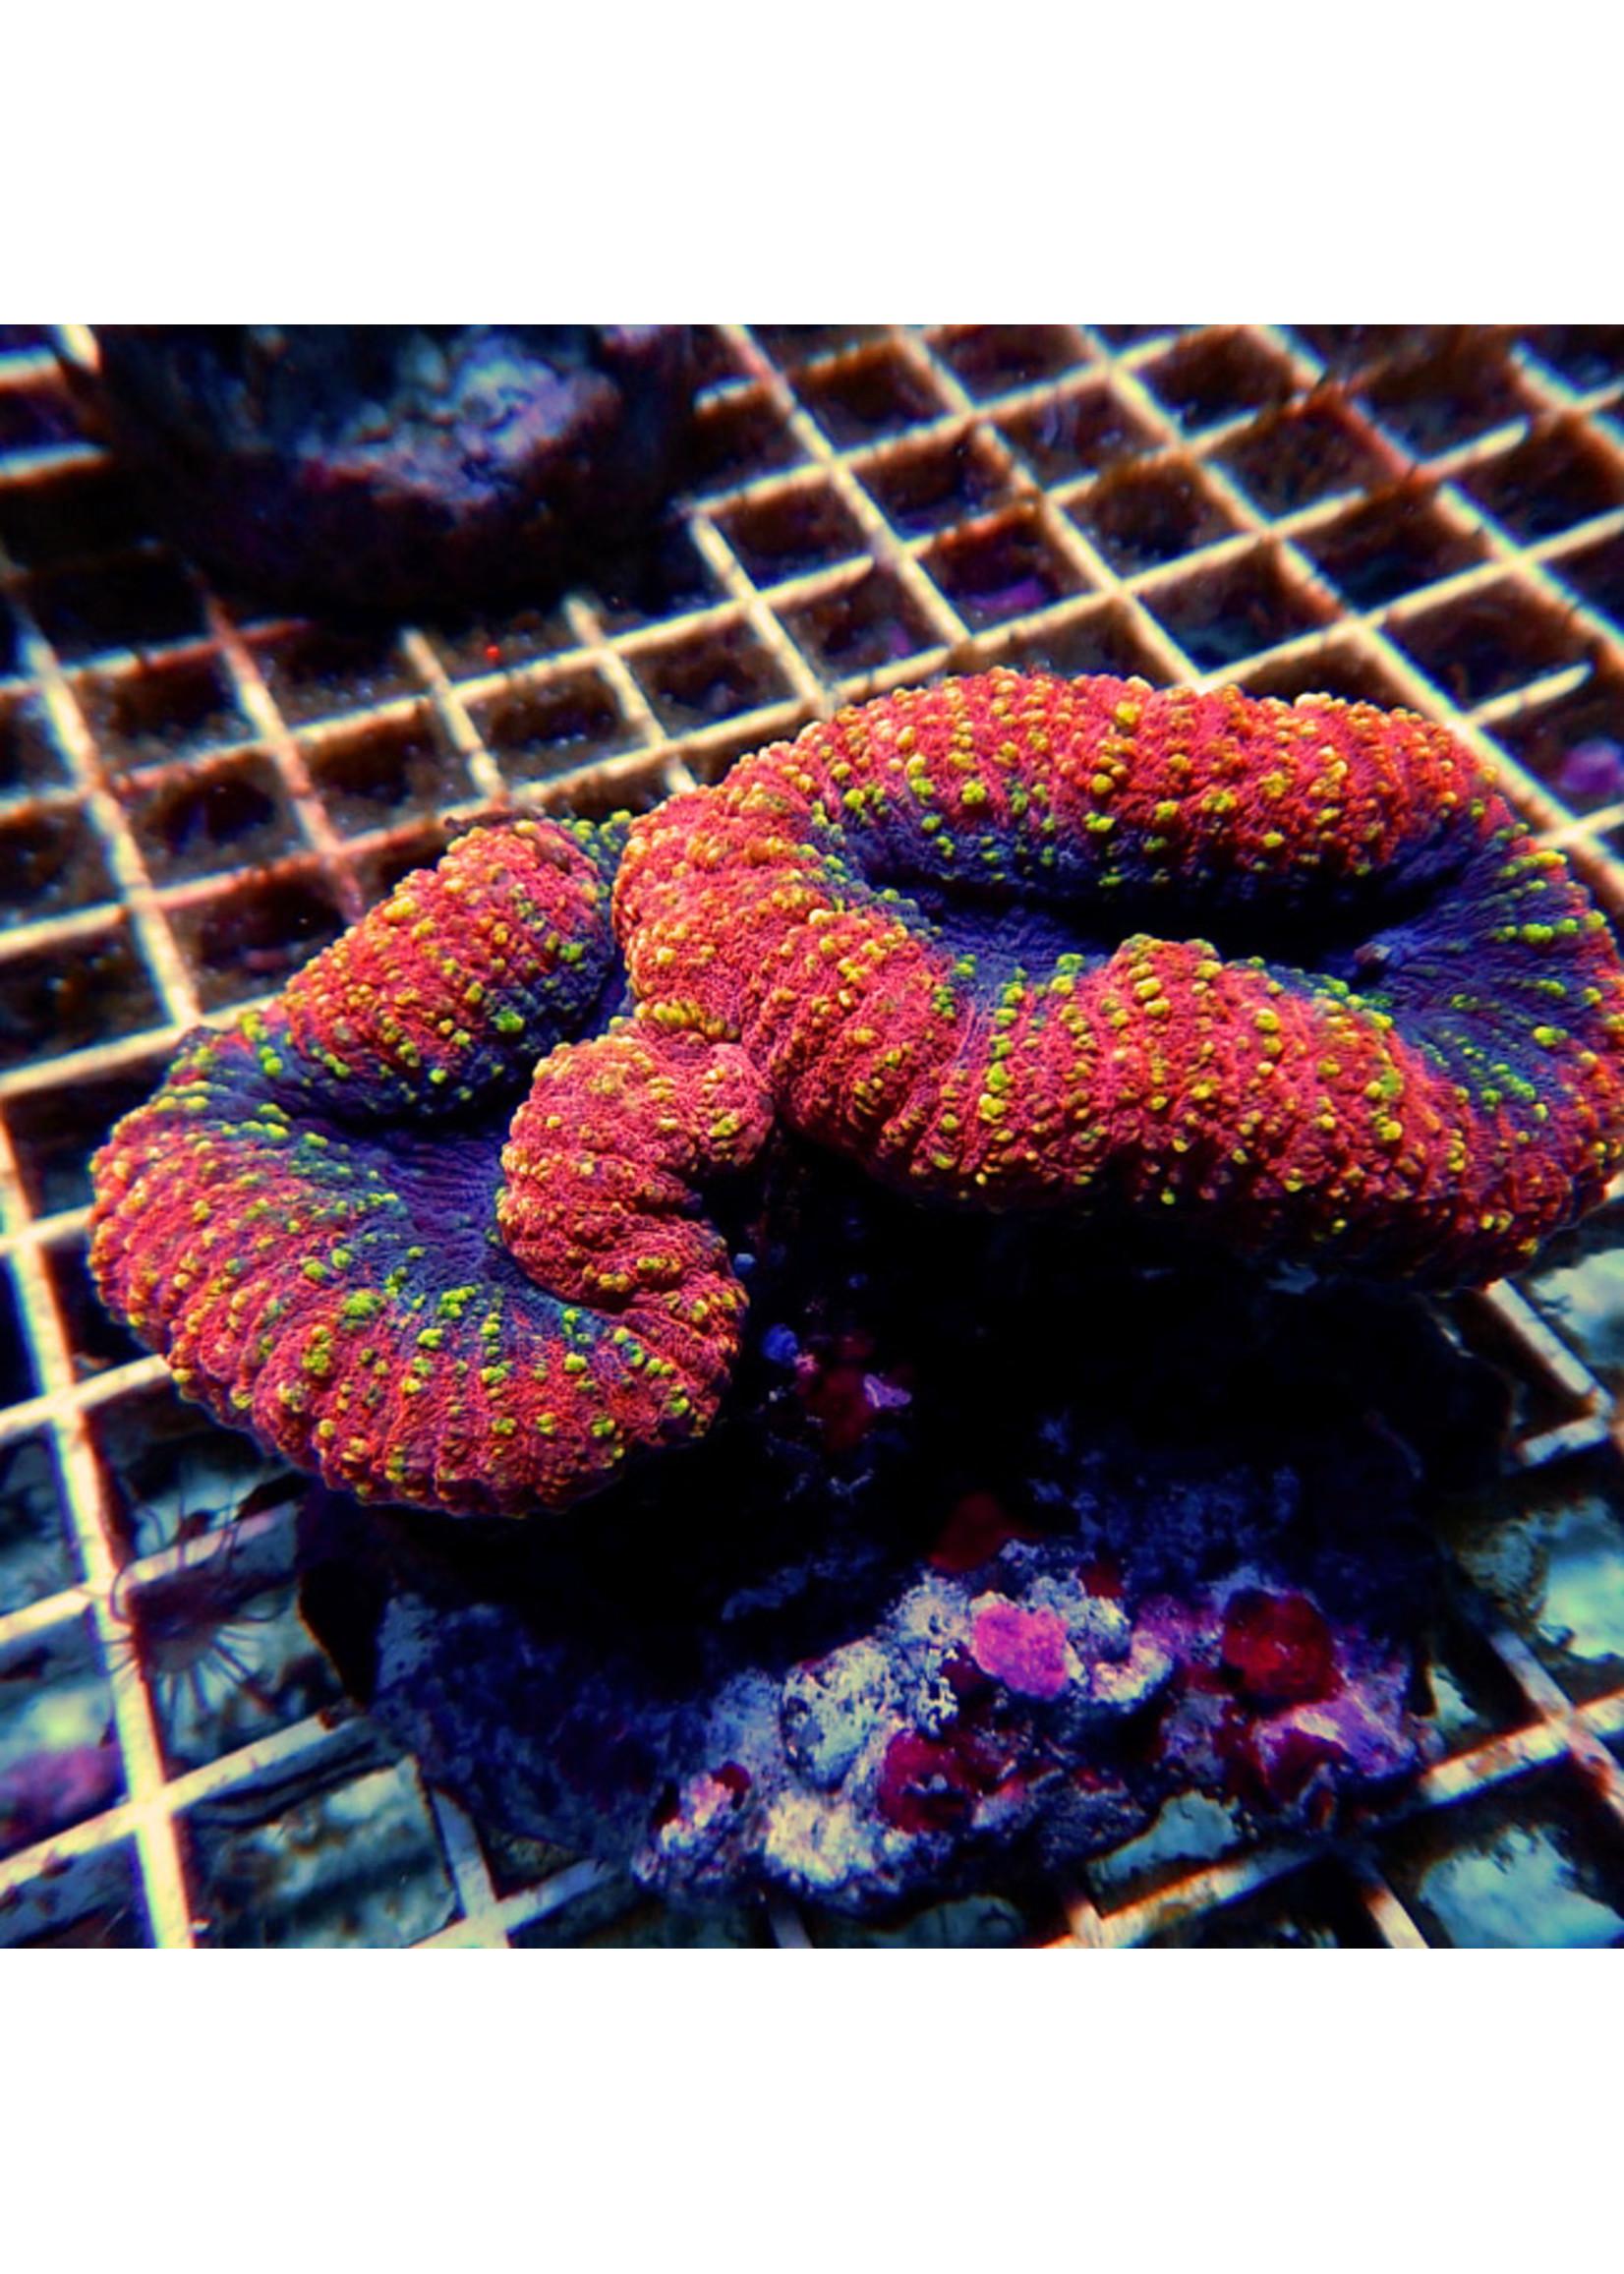 Lobo Kupang Lobo Coral  WYSIWYG